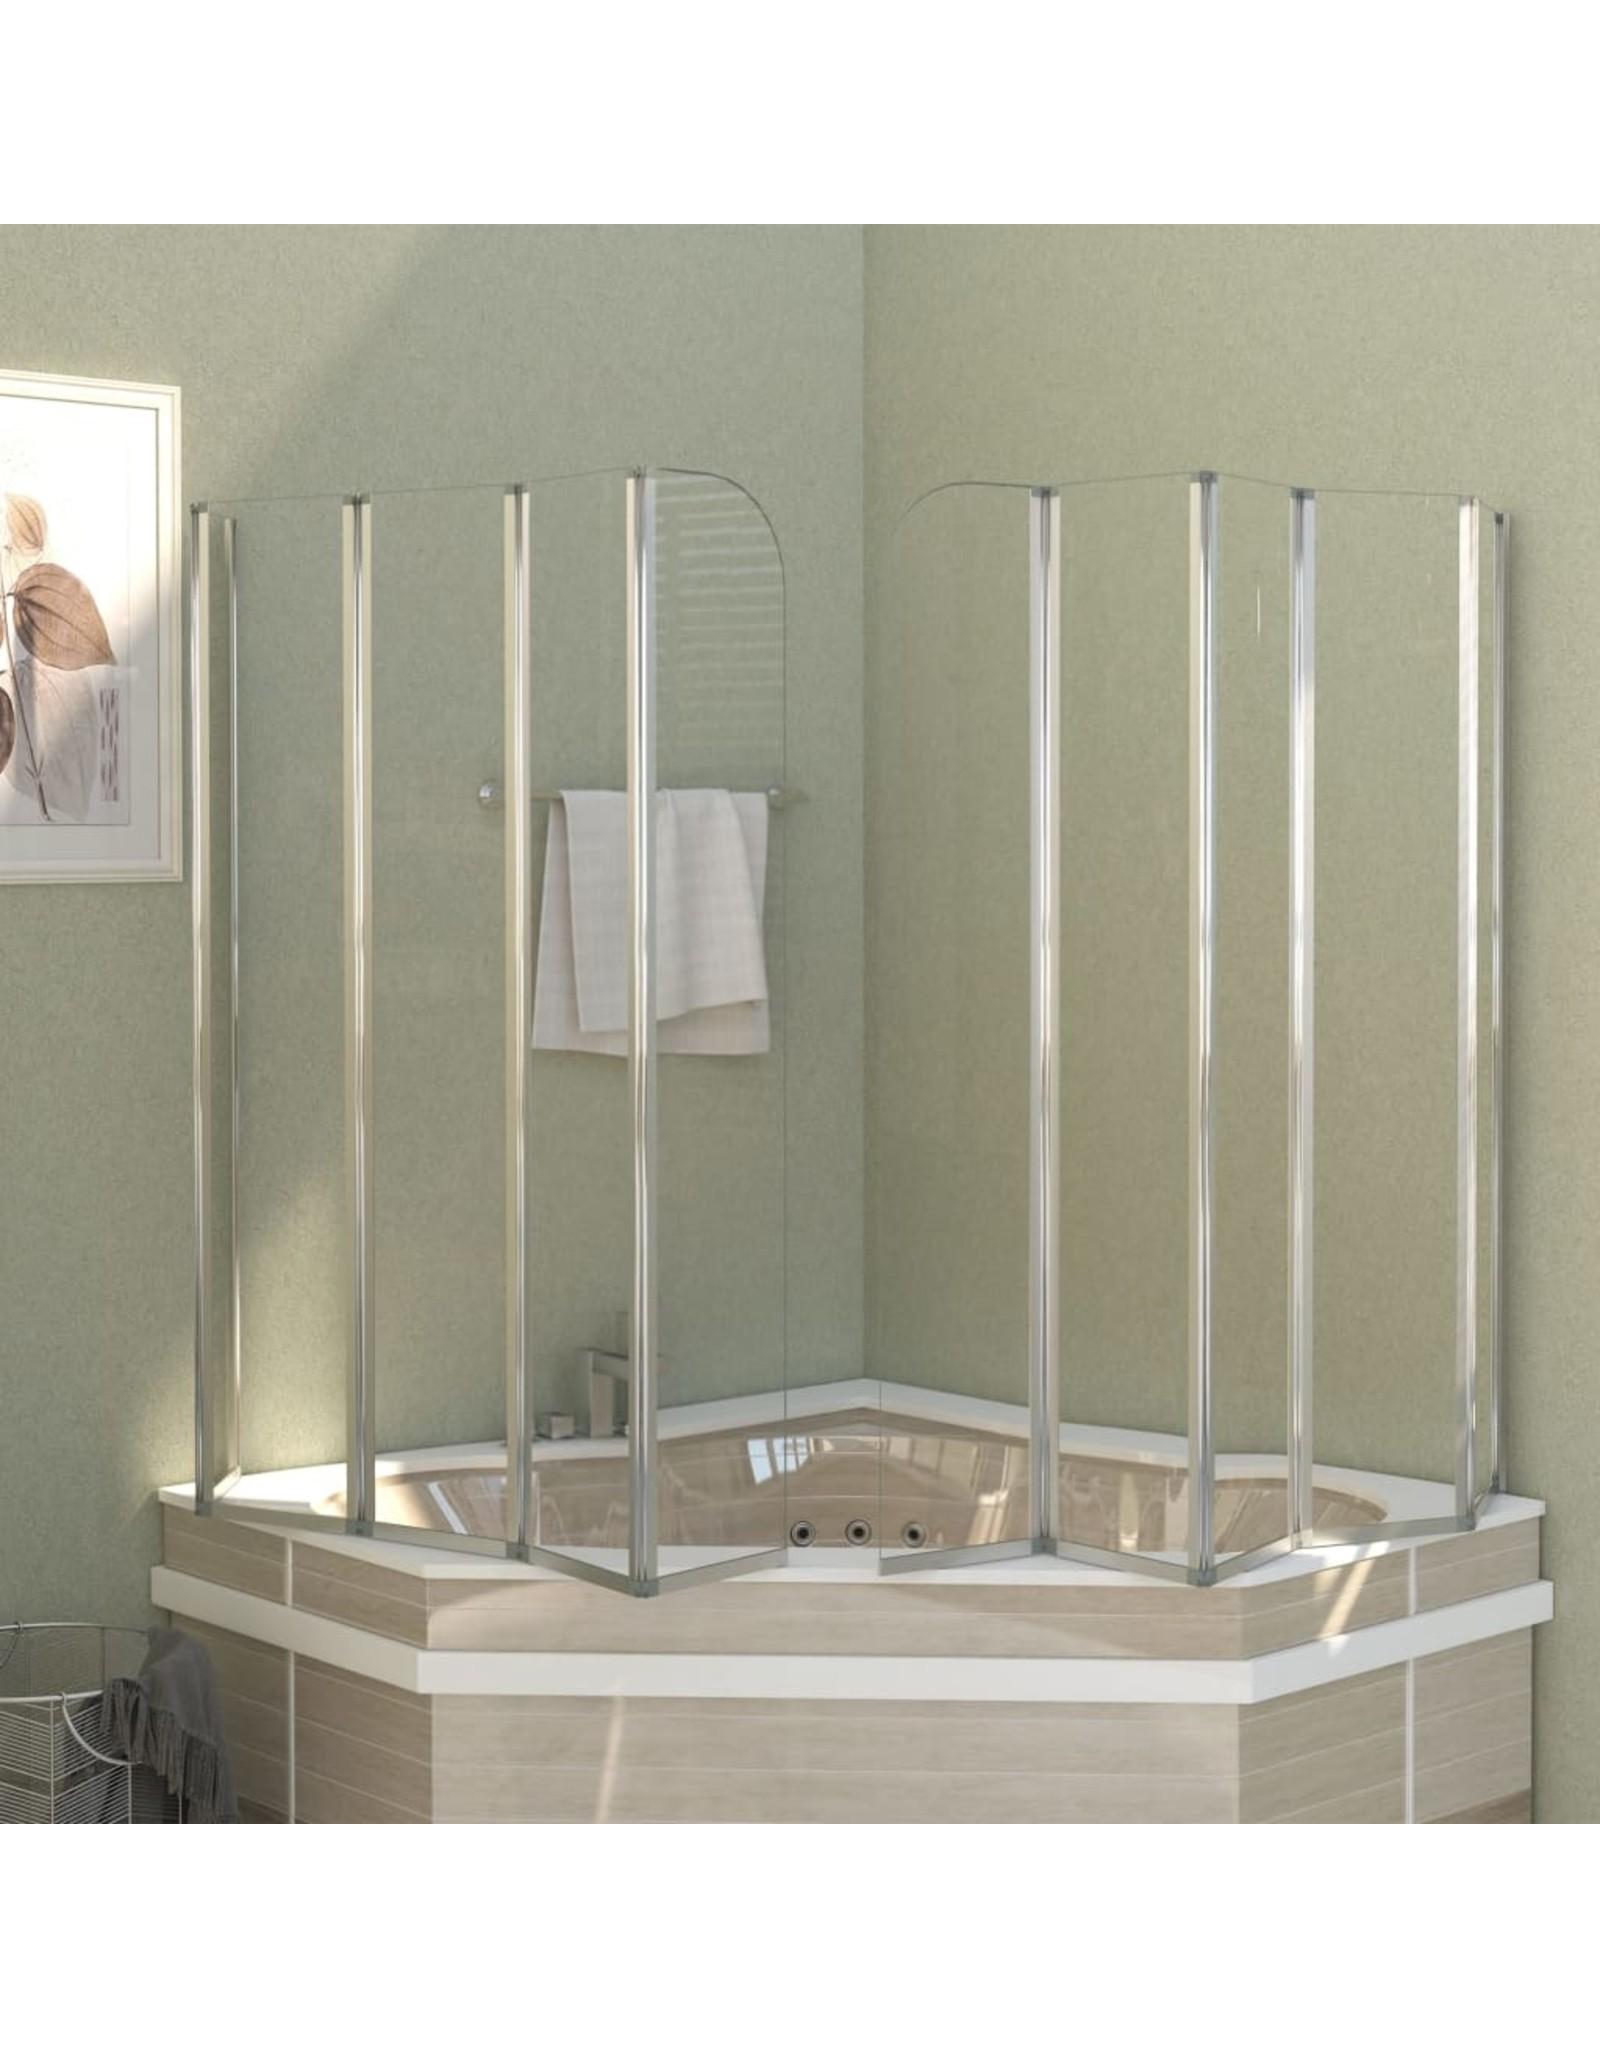 Badwand 120x140 cm gehard glas transparant